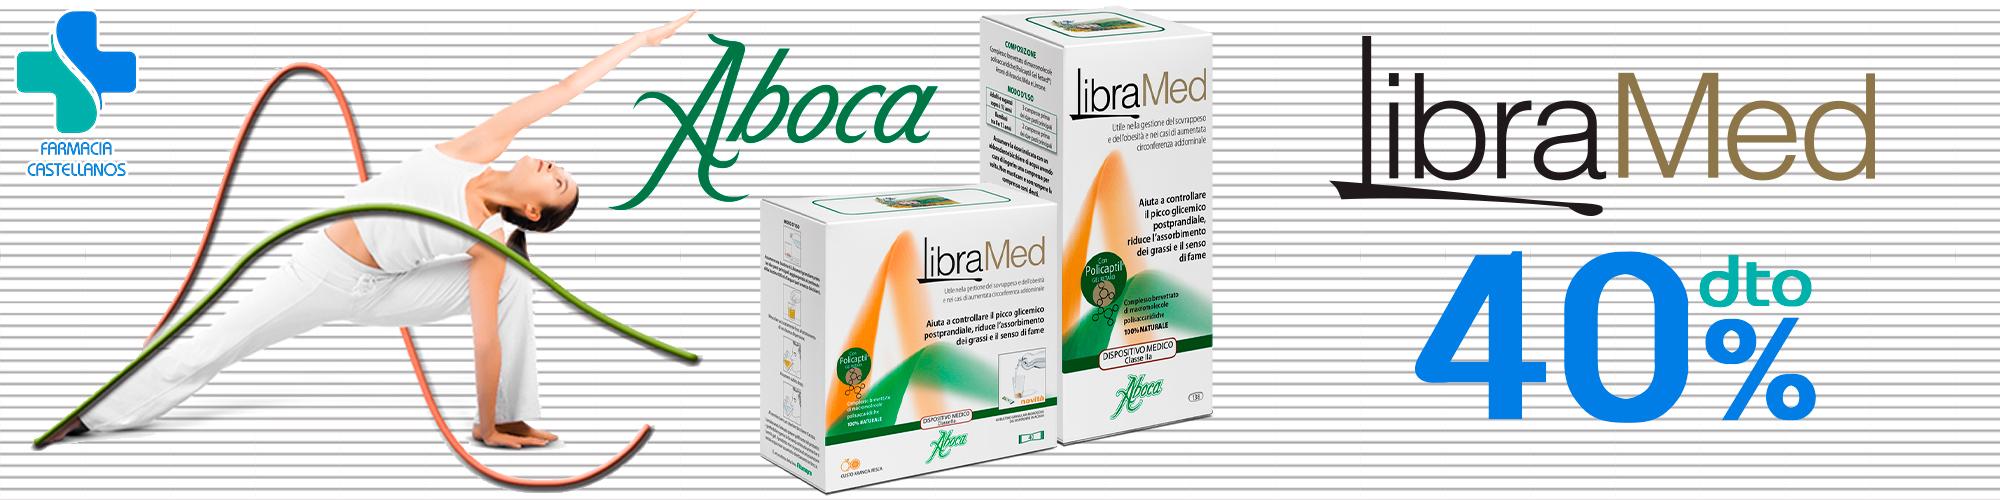 promo-aboca-libramed-farmaciabeatrizcastellanos